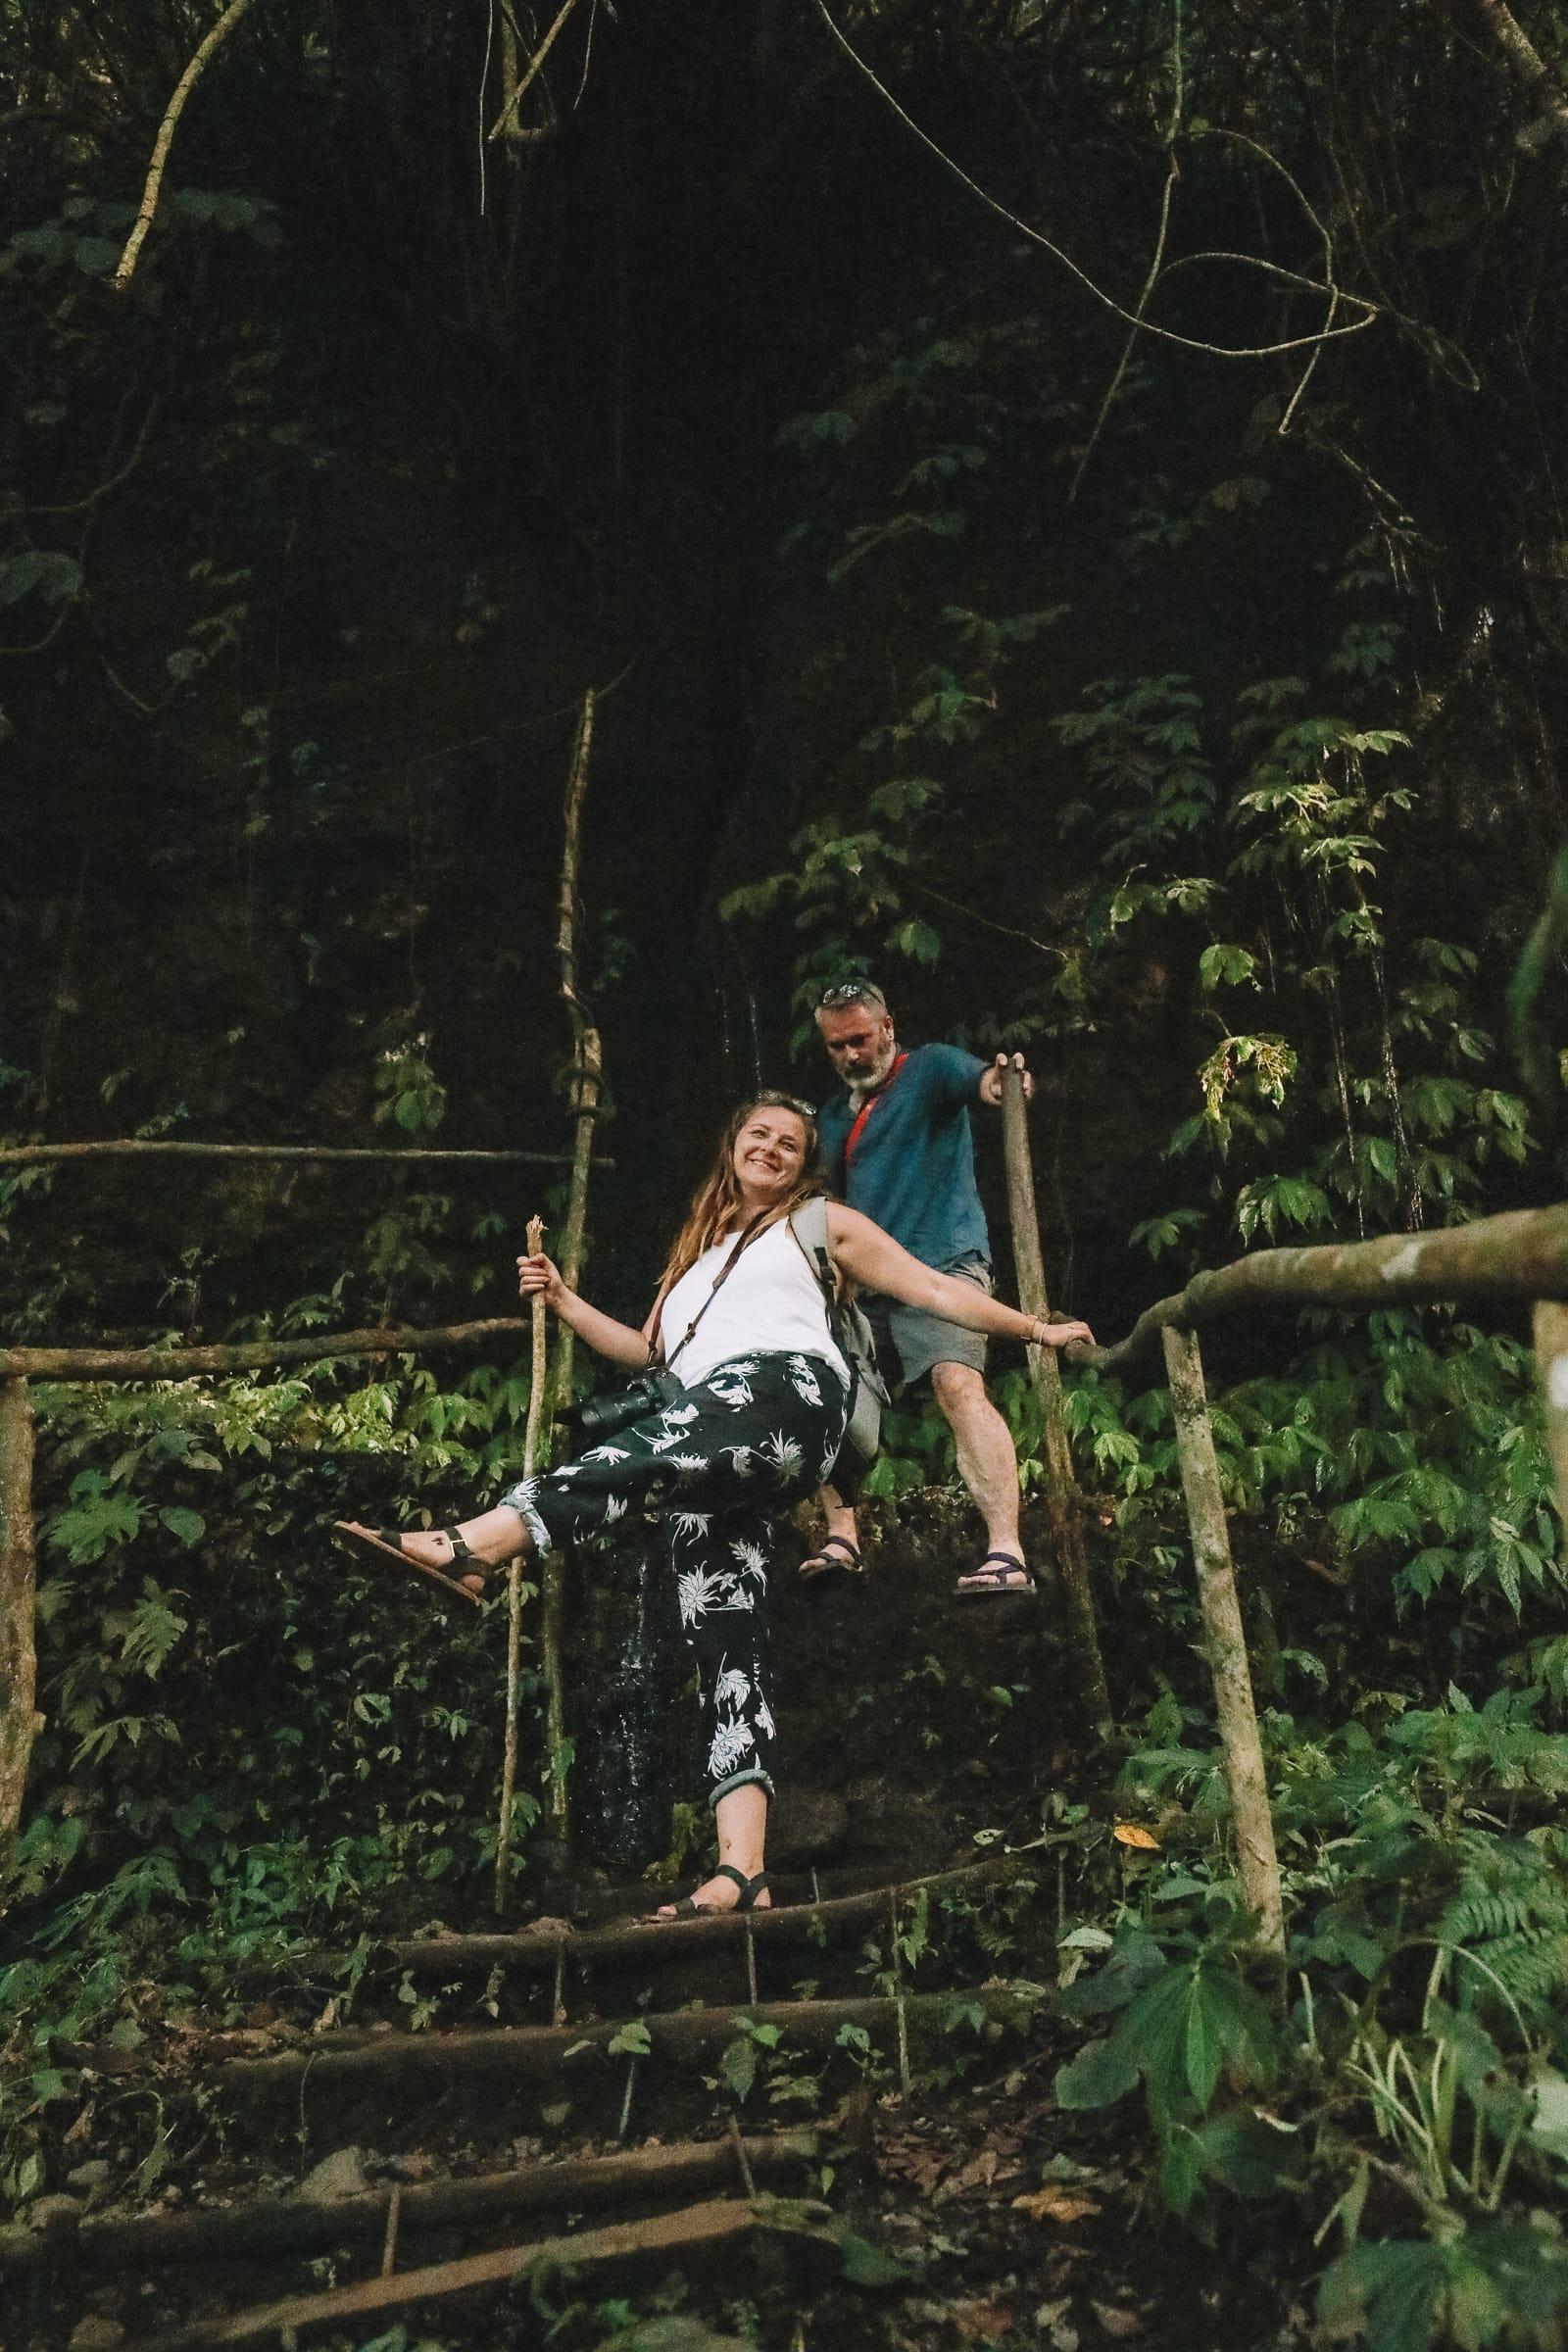 The Amazing Banyumala Twin Waterfalls In The Jungles Of Bali (9)